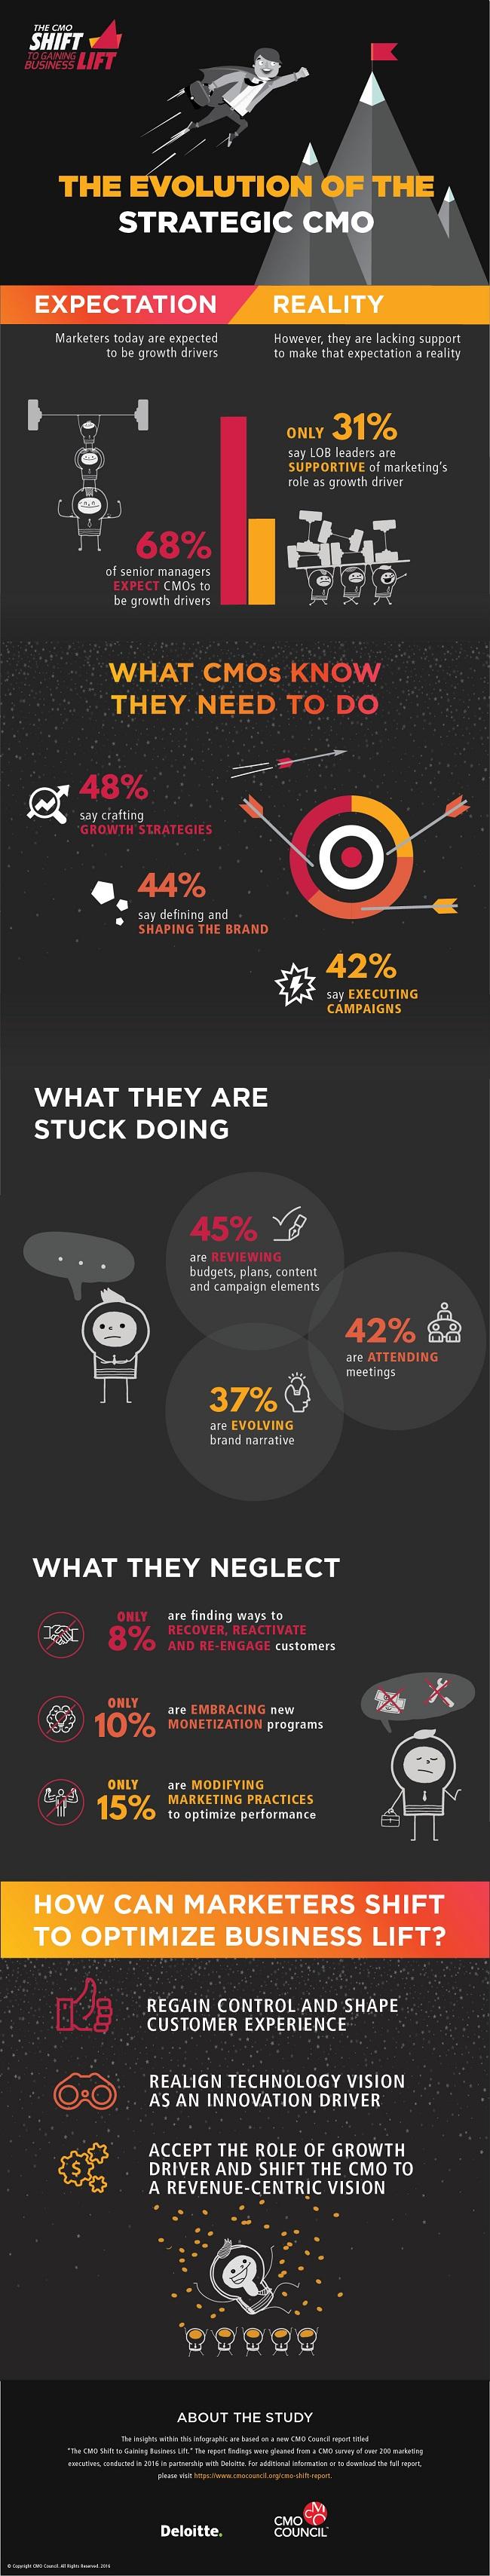 cmo_shift_infographic-1